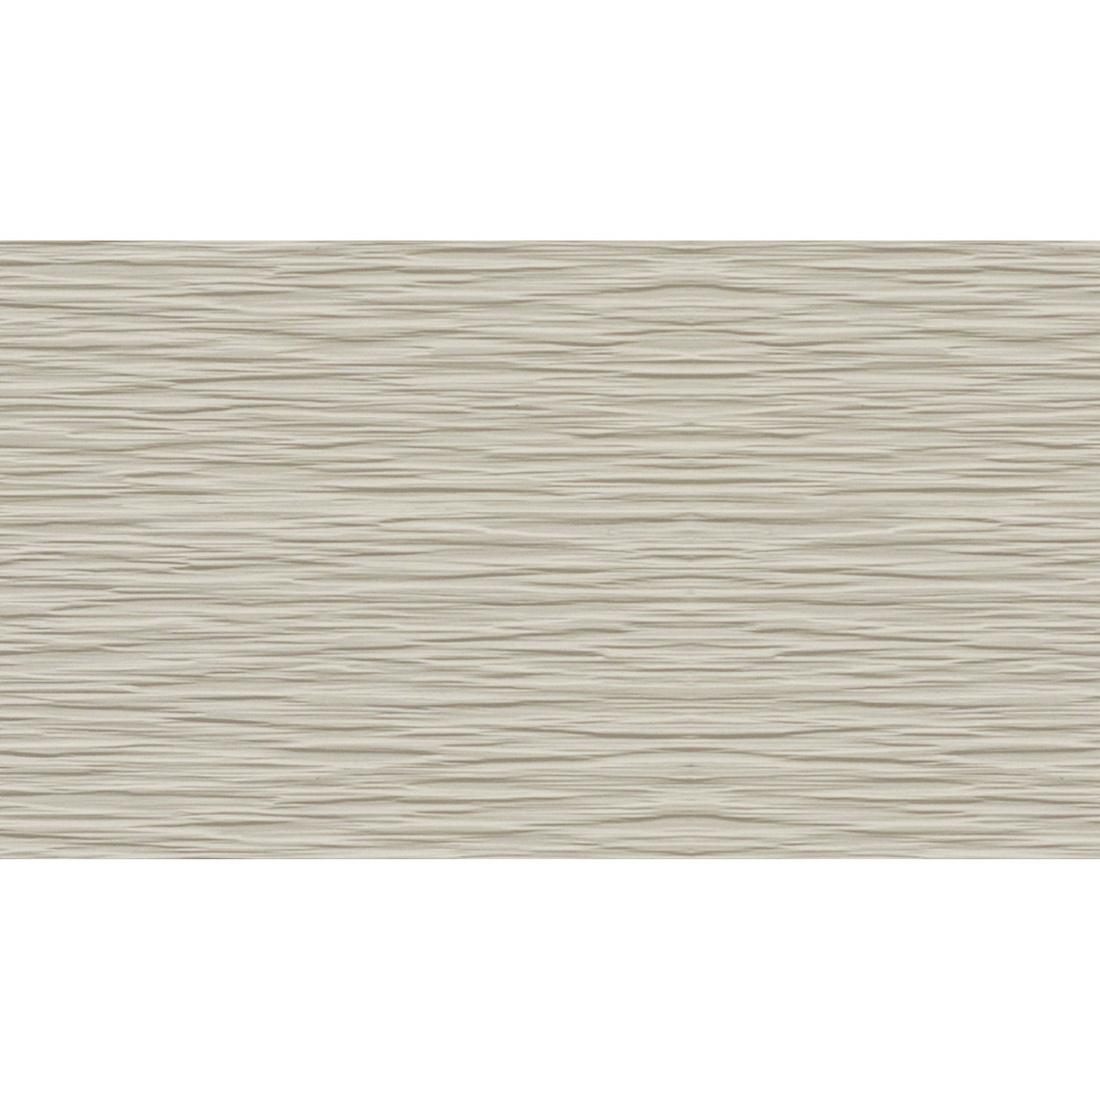 Territory Canyon 16x455x3030mm Panel Ripple 2 Sheet